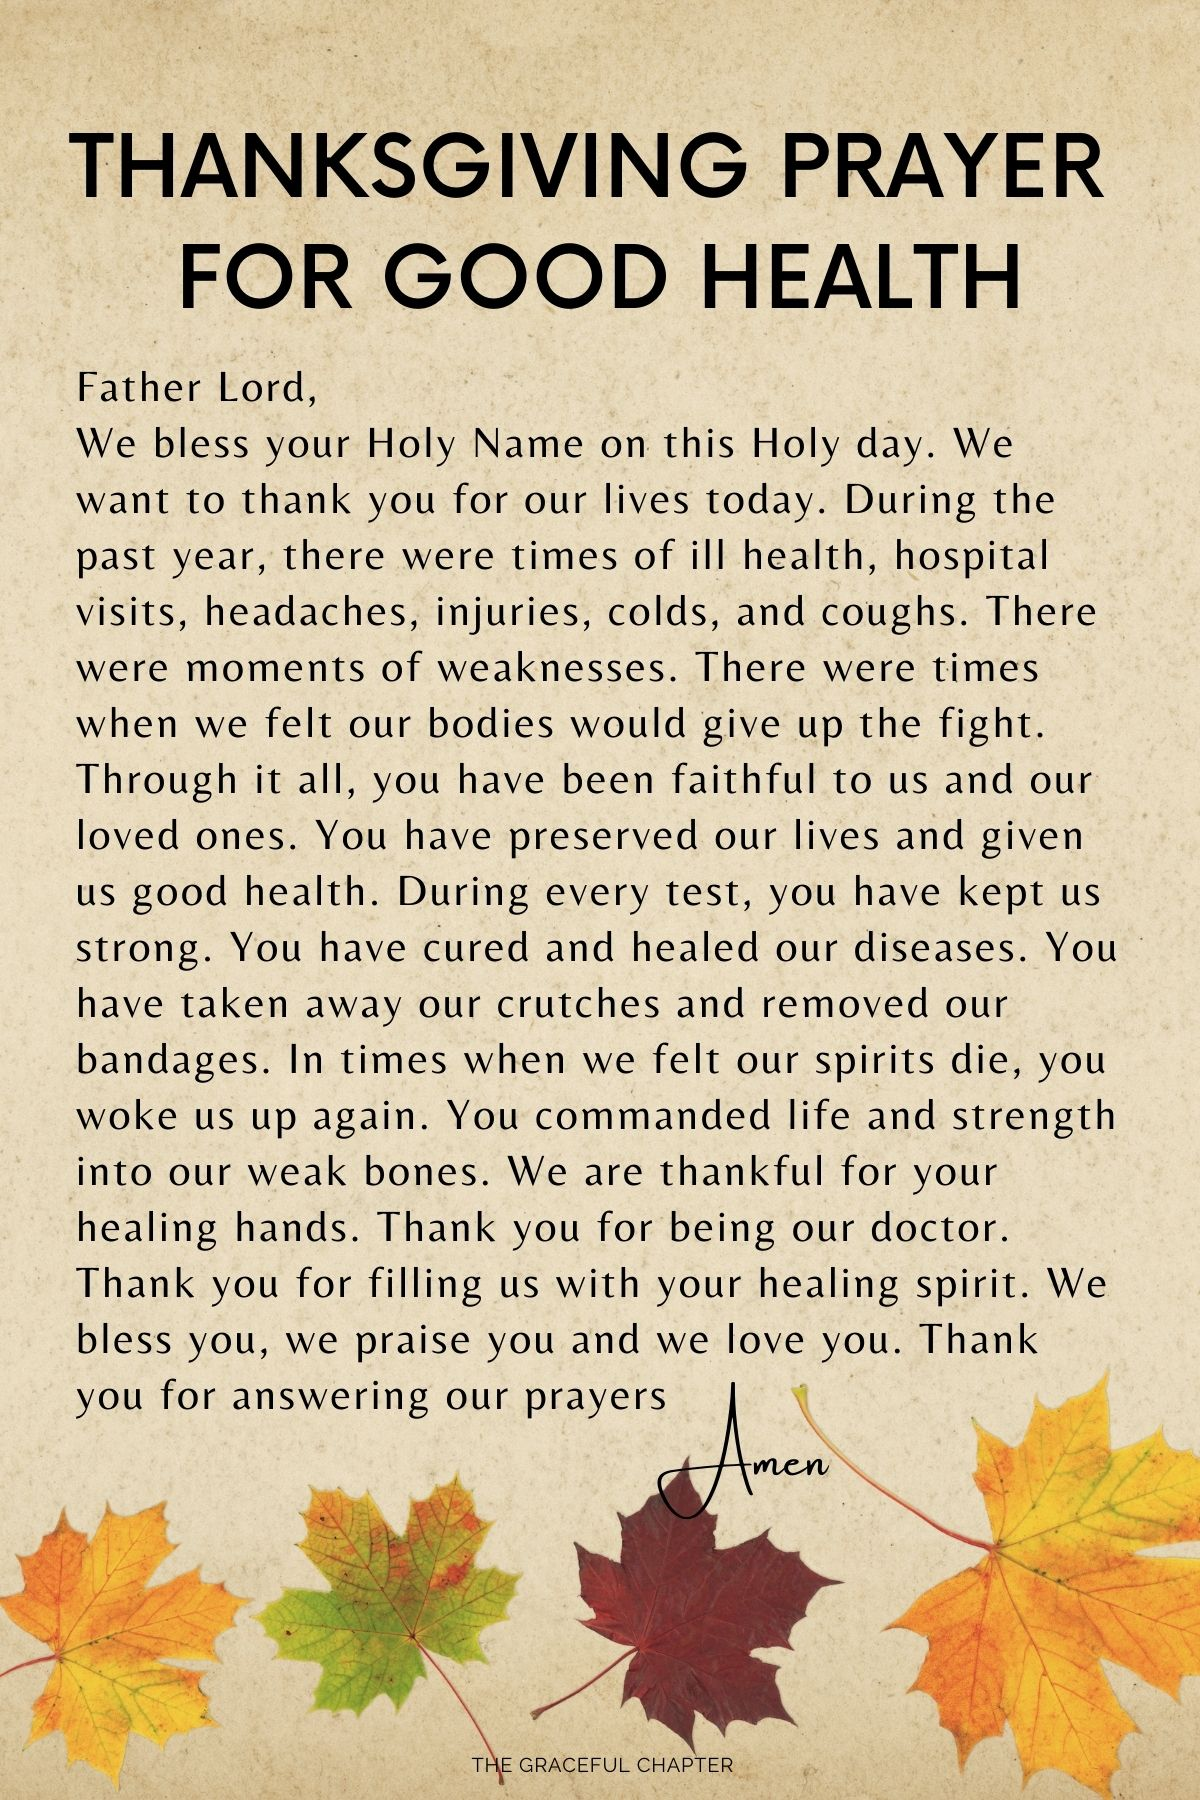 Thanksgiving prayer for good health - prayers for thanksgiving day